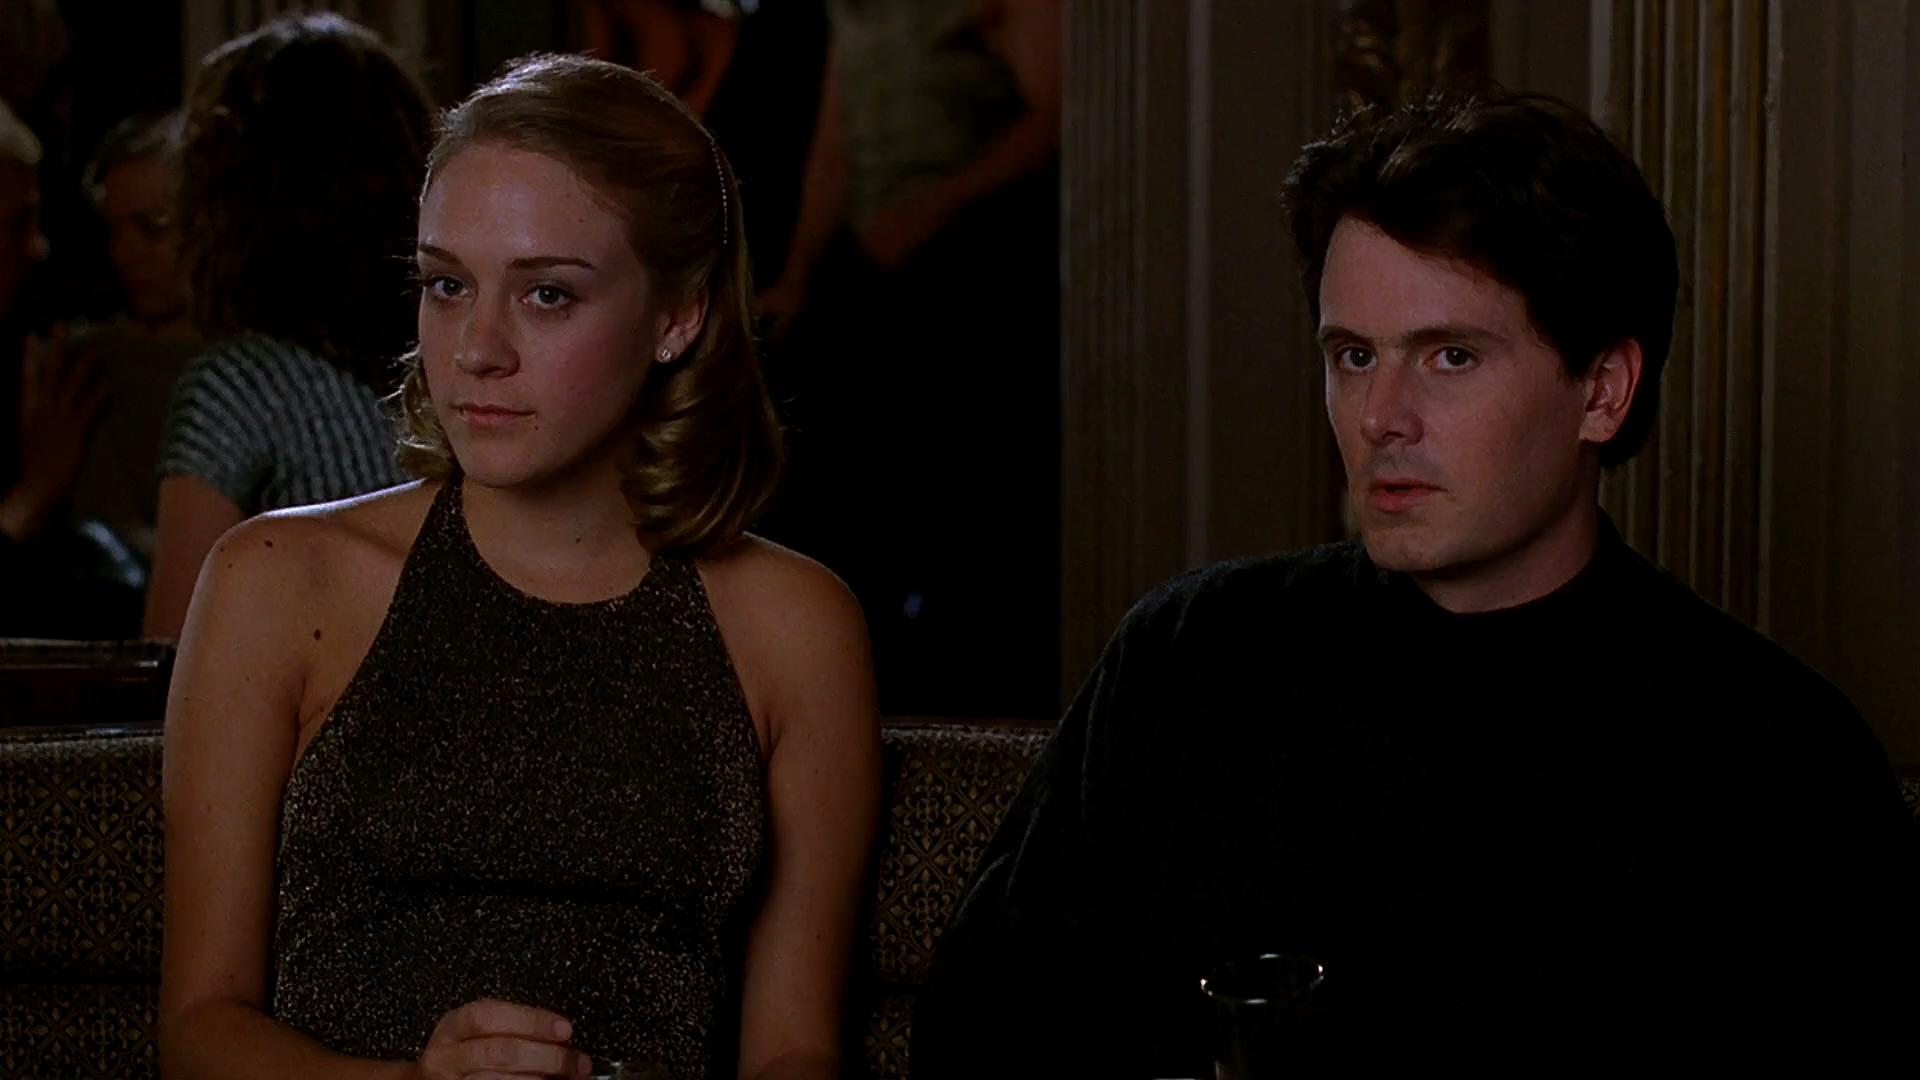 Chris Eigeman and Chloë Sevigny in The Last Days of Disco (1998)